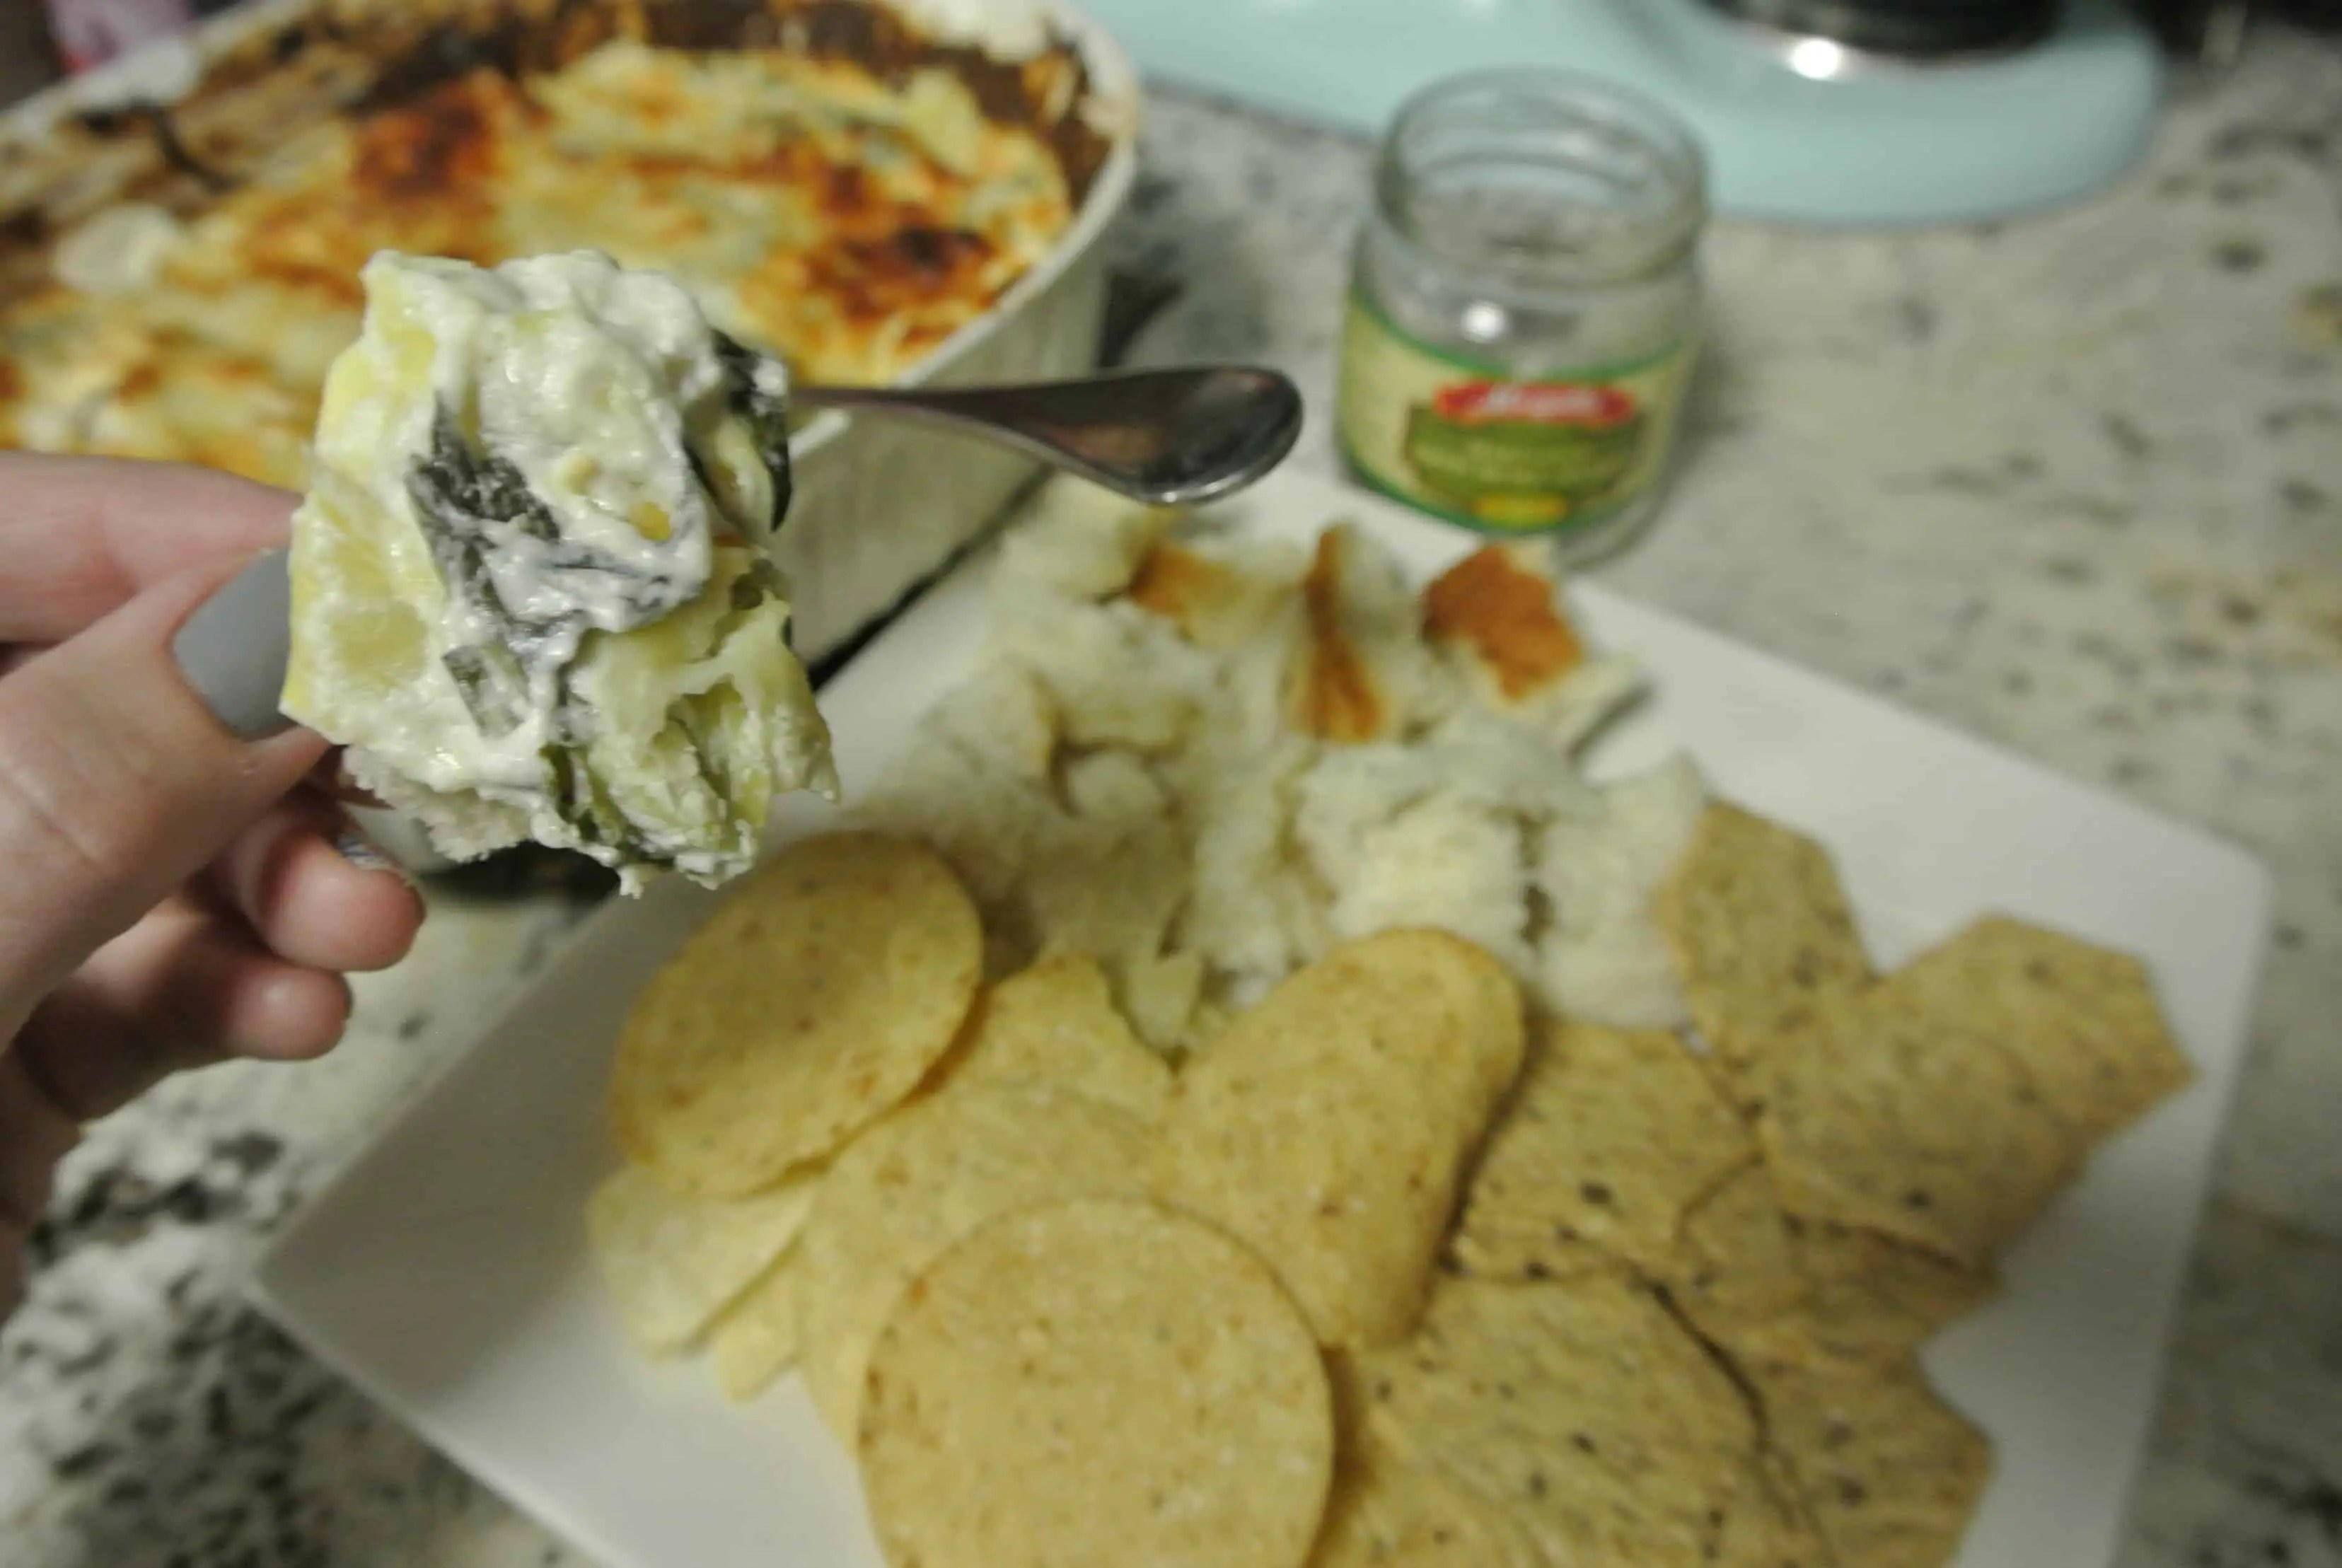 healthier hot artichoke spinach dip